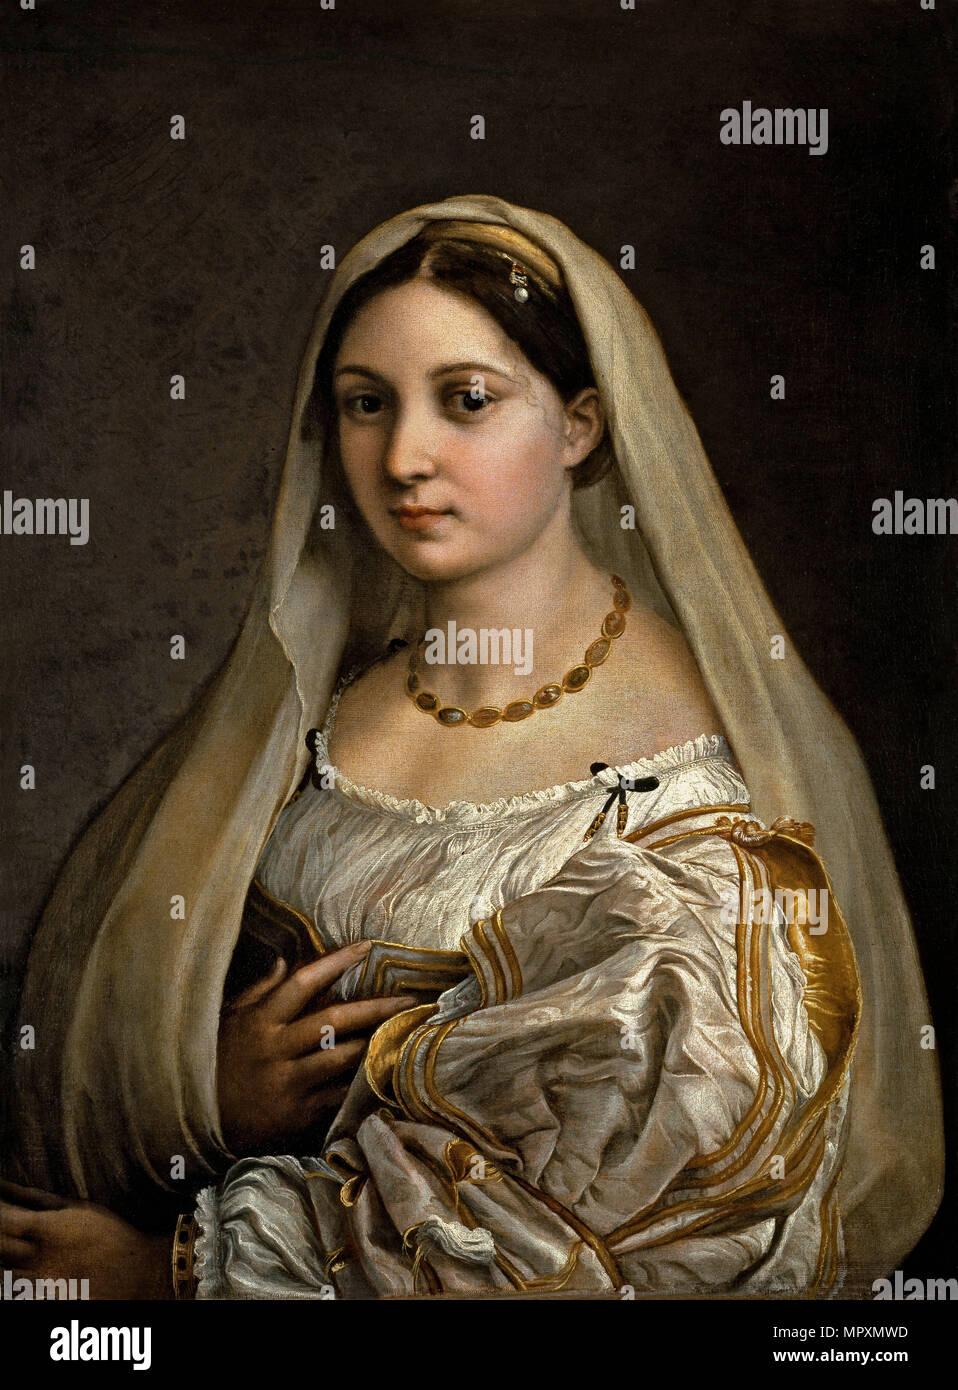 La donna velata (The woman with the veil), 1516. Stock Photo